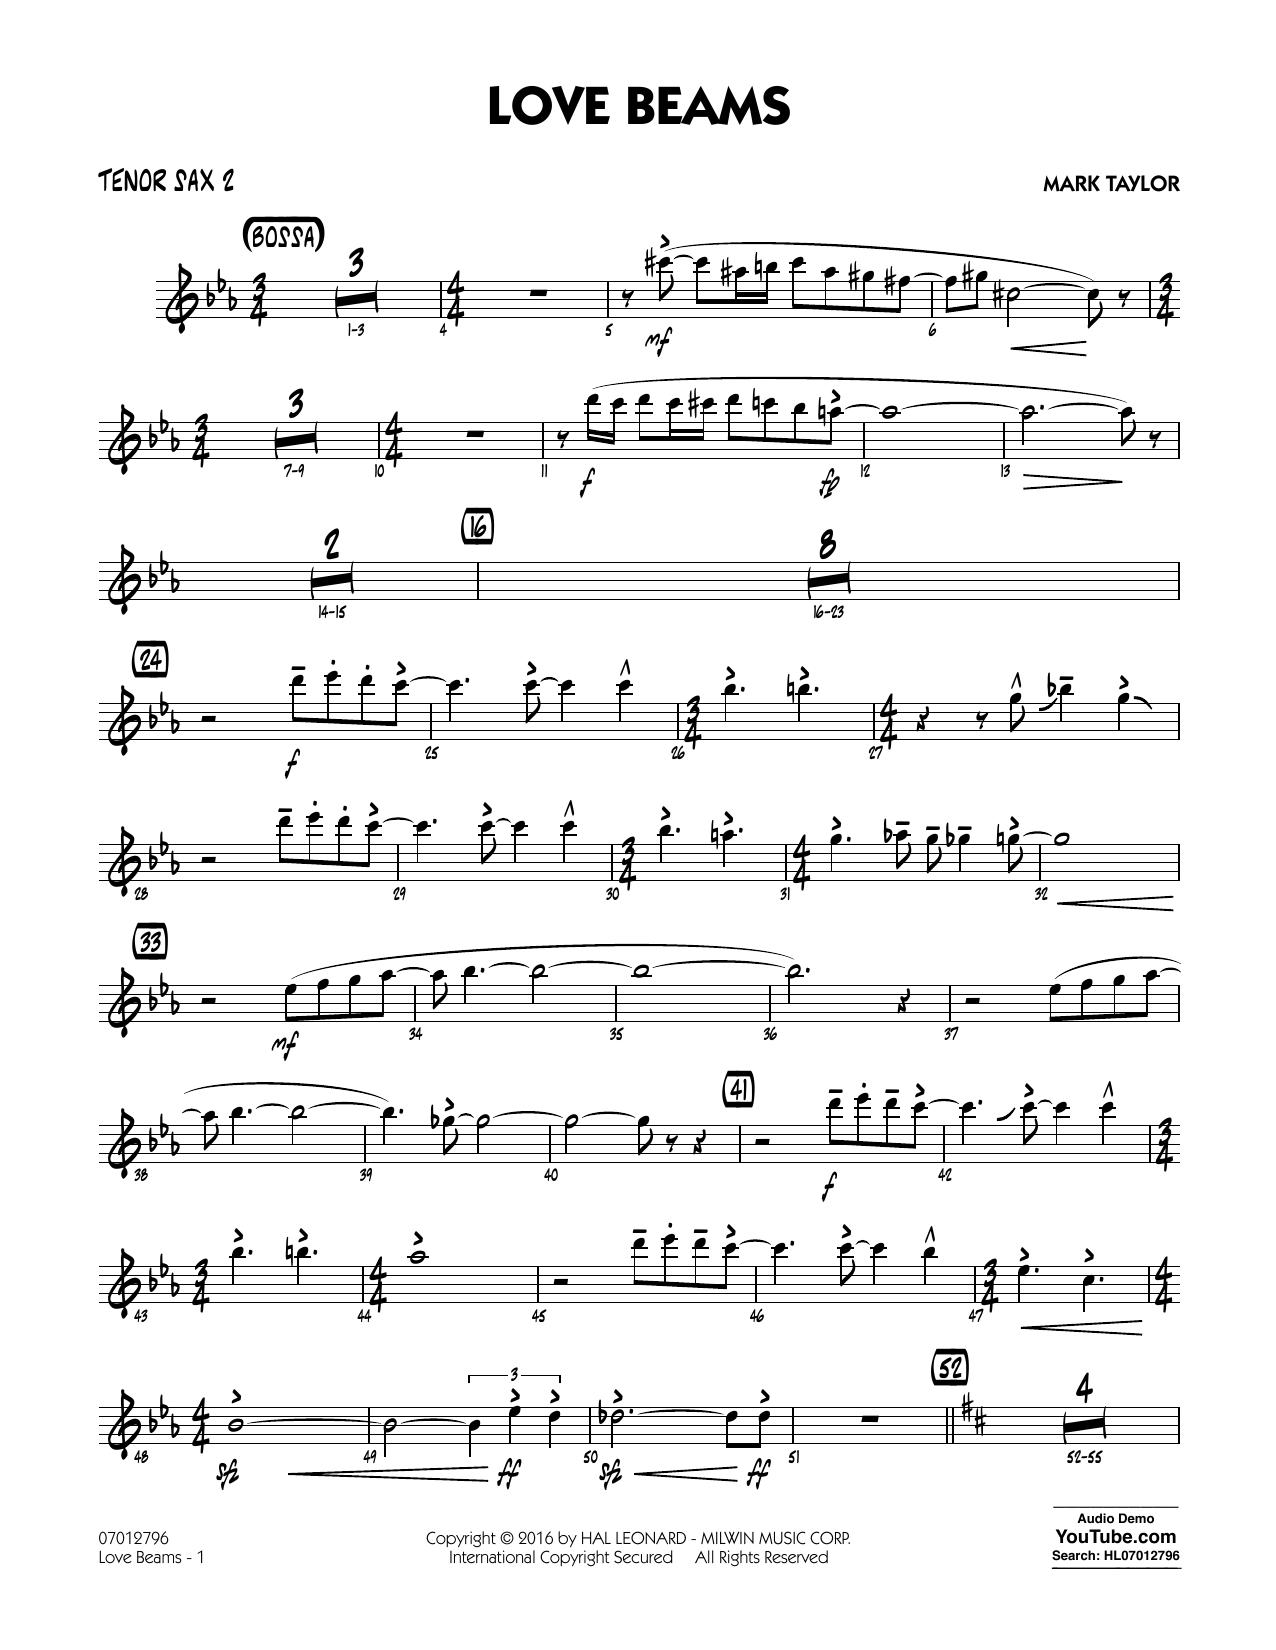 Love Beams - Tenor Sax 2